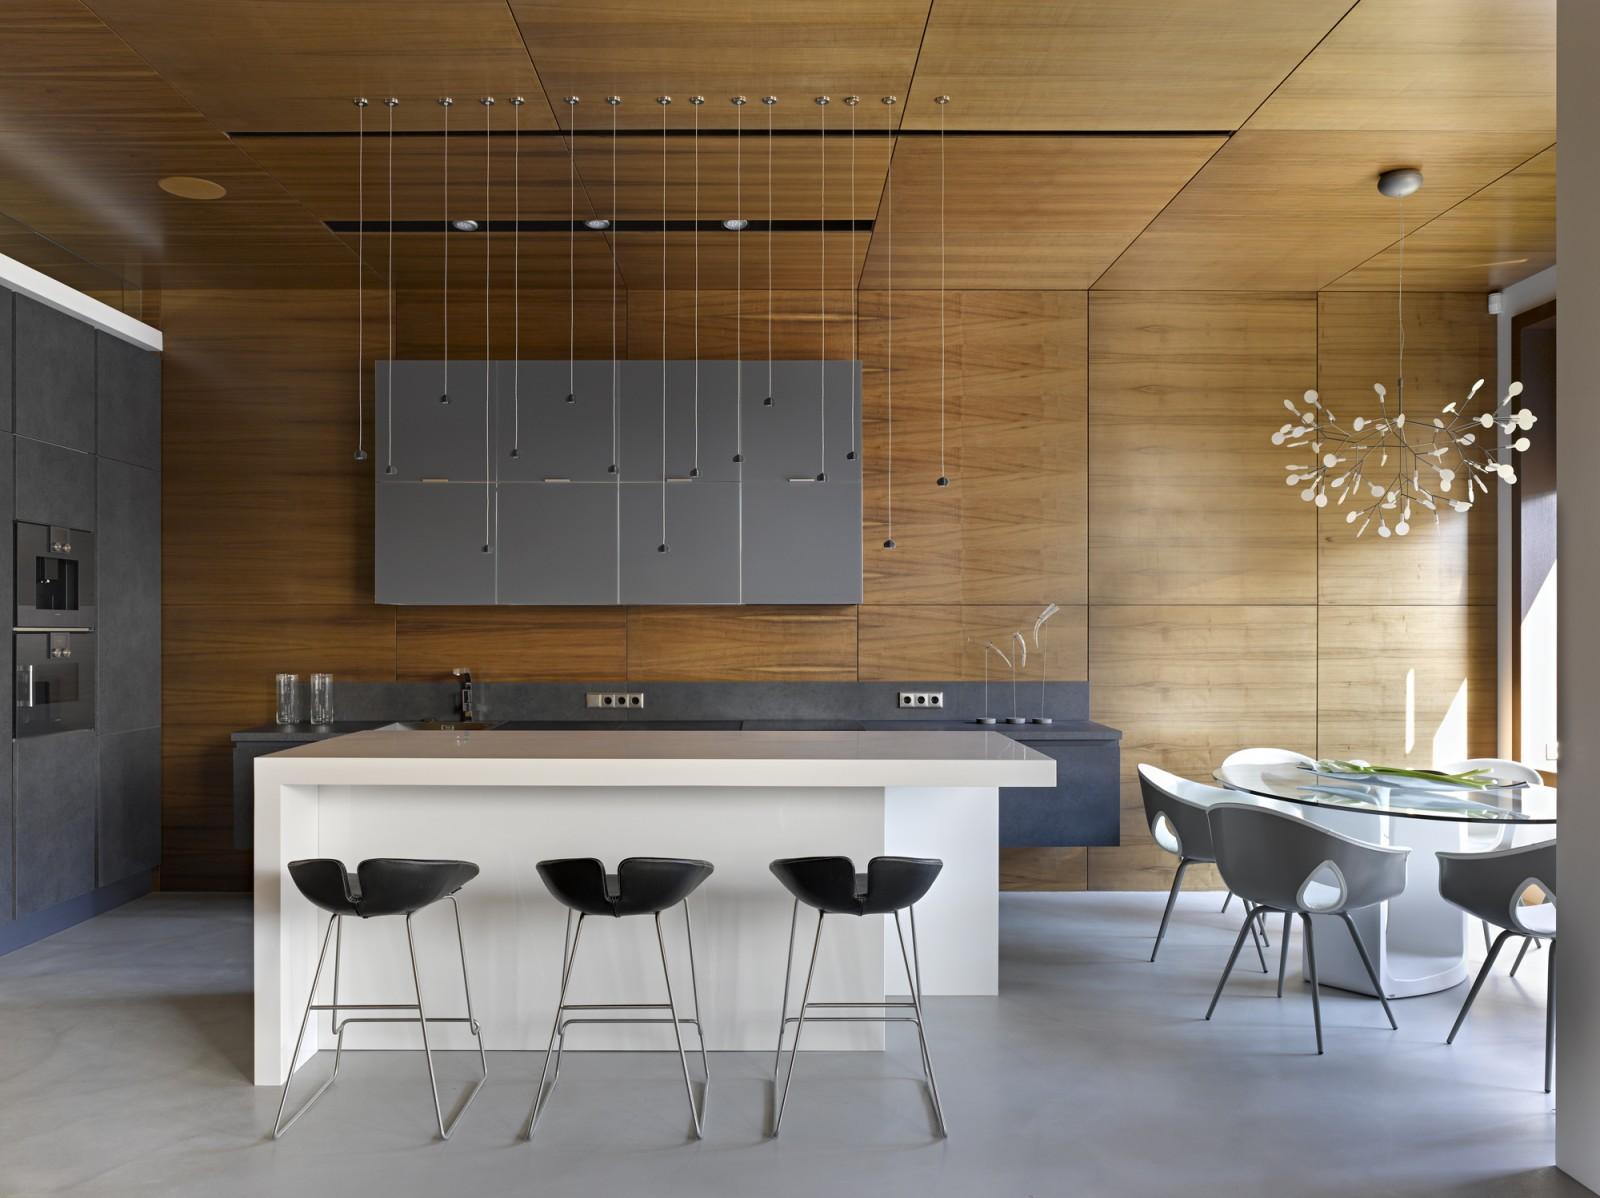 Nice villa interior by architectural Bureau of Alexandra Fedorova - 09